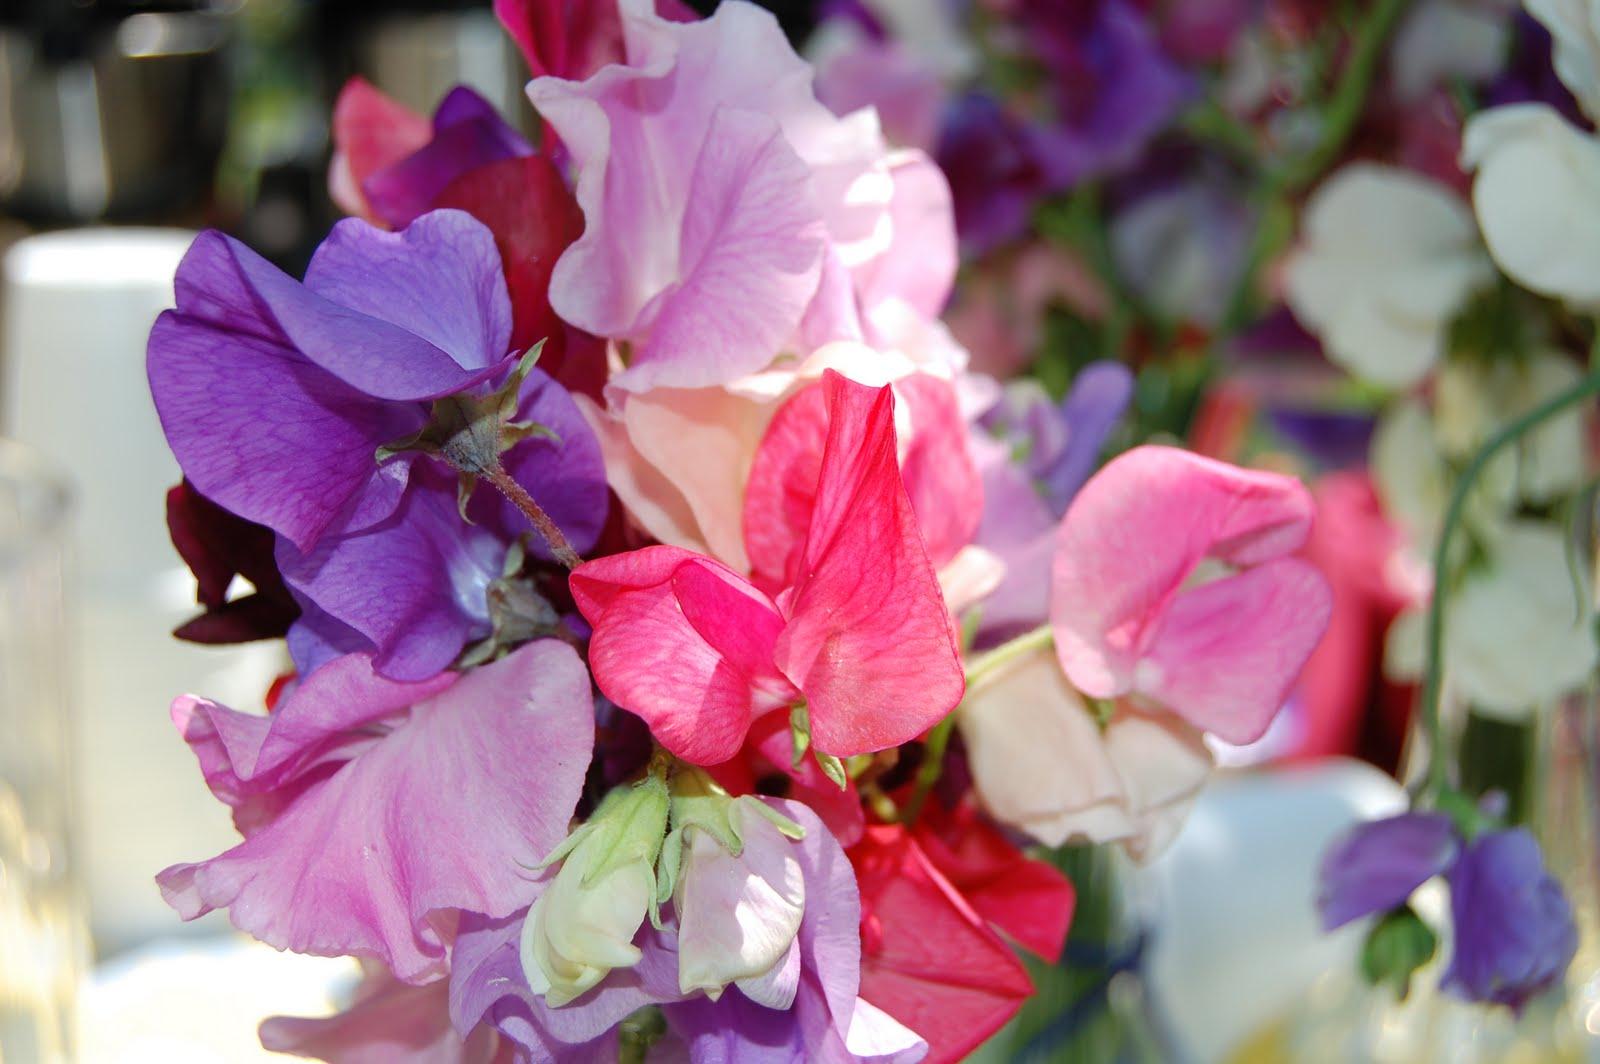 Sweet Pea Flowers Nature & Flowers